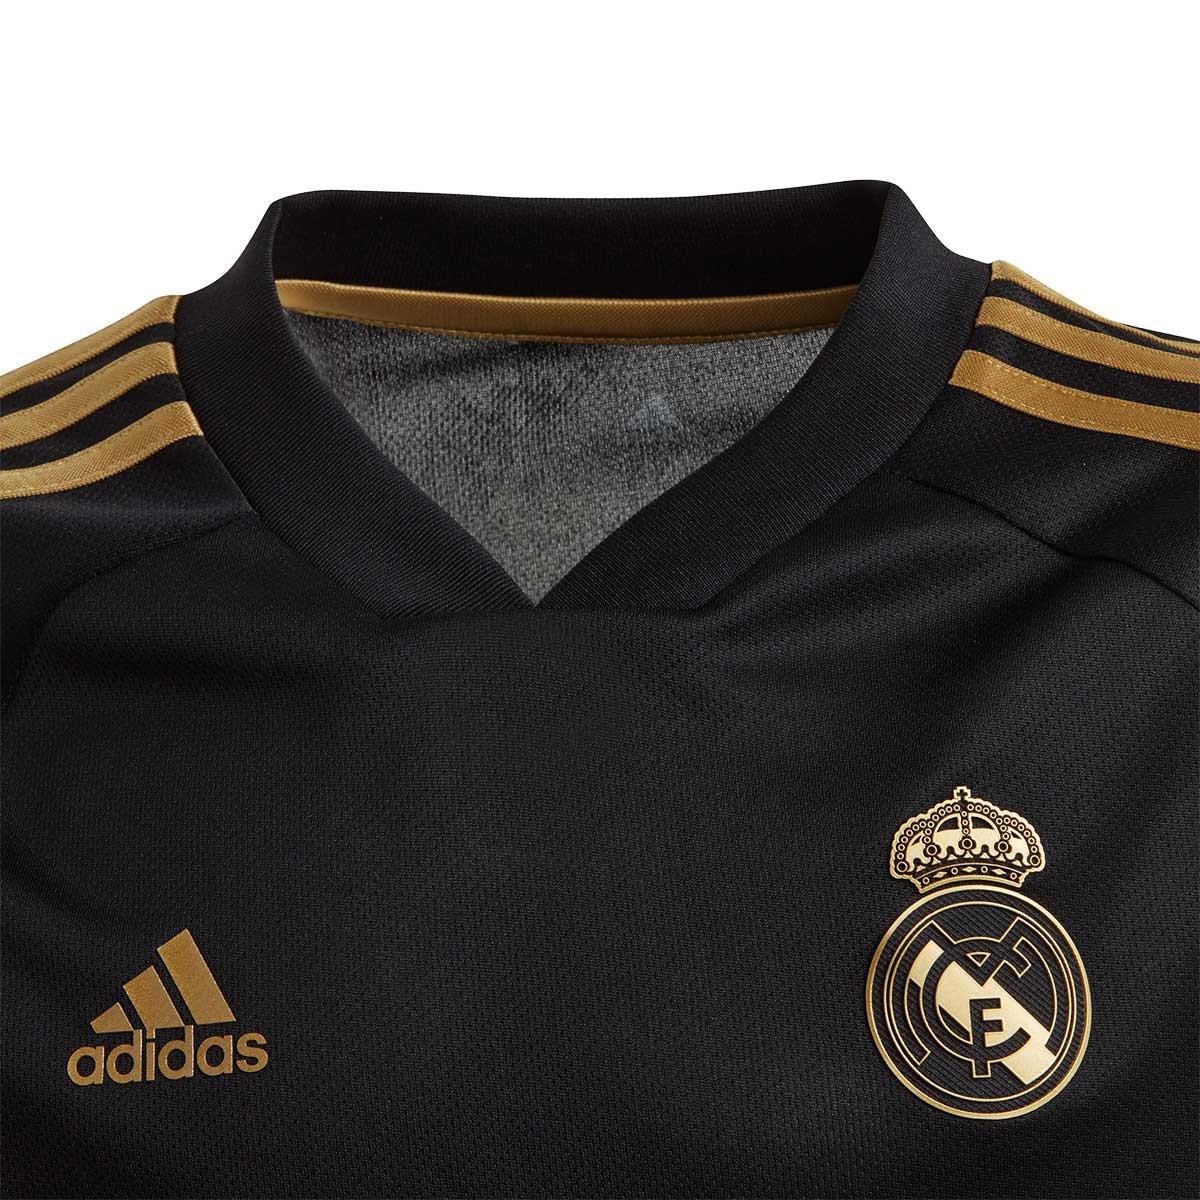 buy online dcb26 cc15e Camiseta Real Madrid Training 2019-2020 Niño Black-Dark football gold